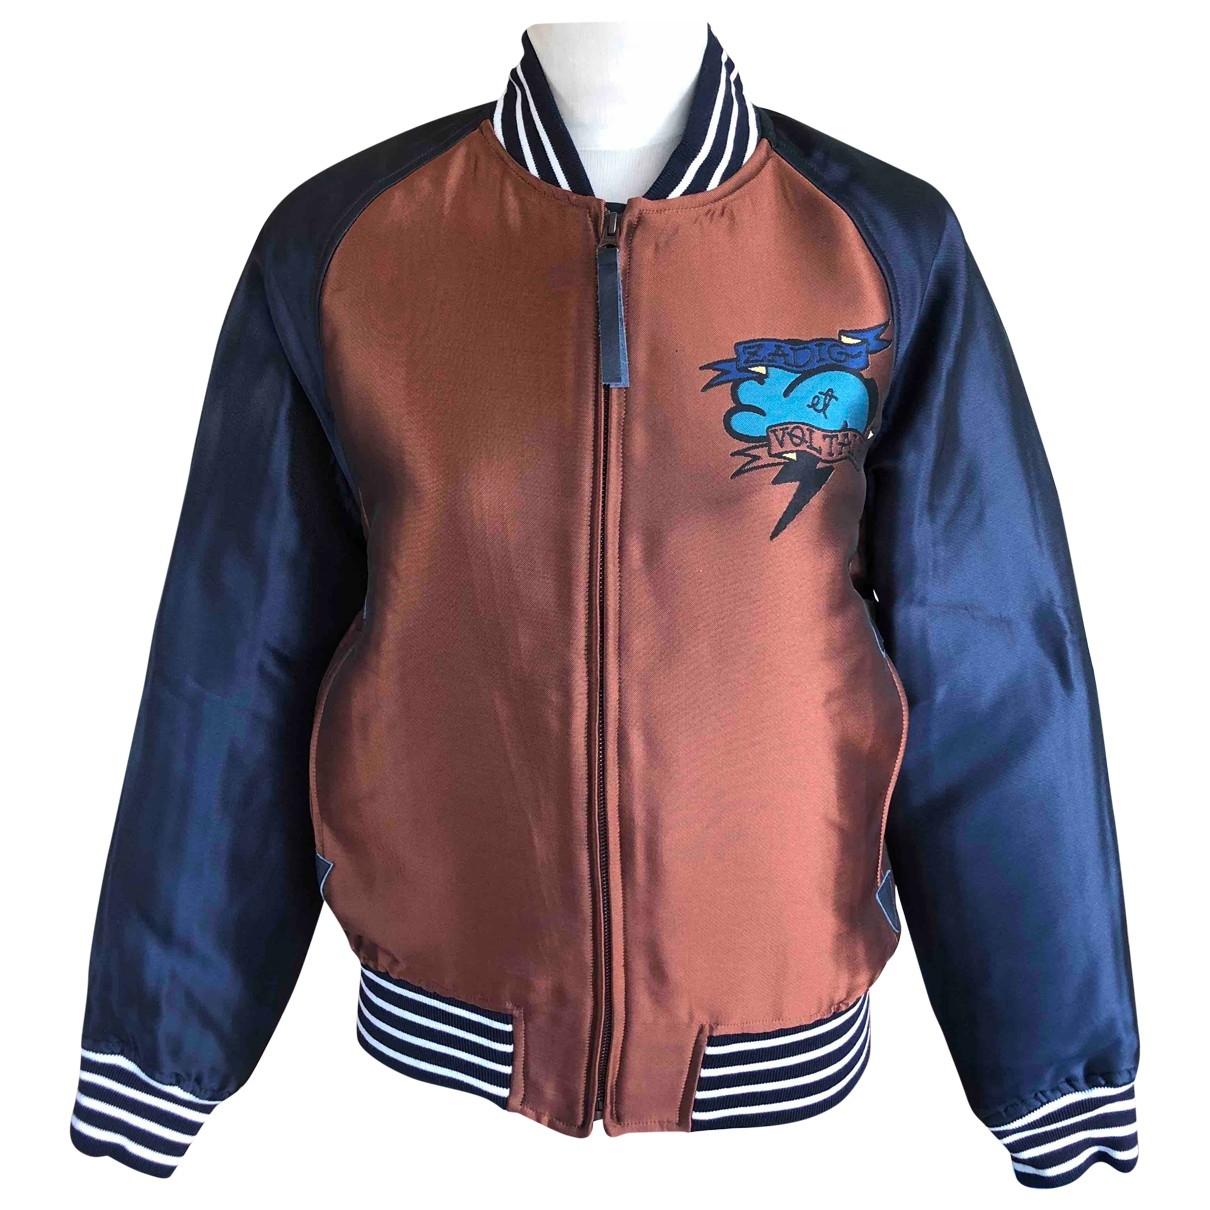 Zadig & Voltaire \N Multicolour jacket  for Men XS International